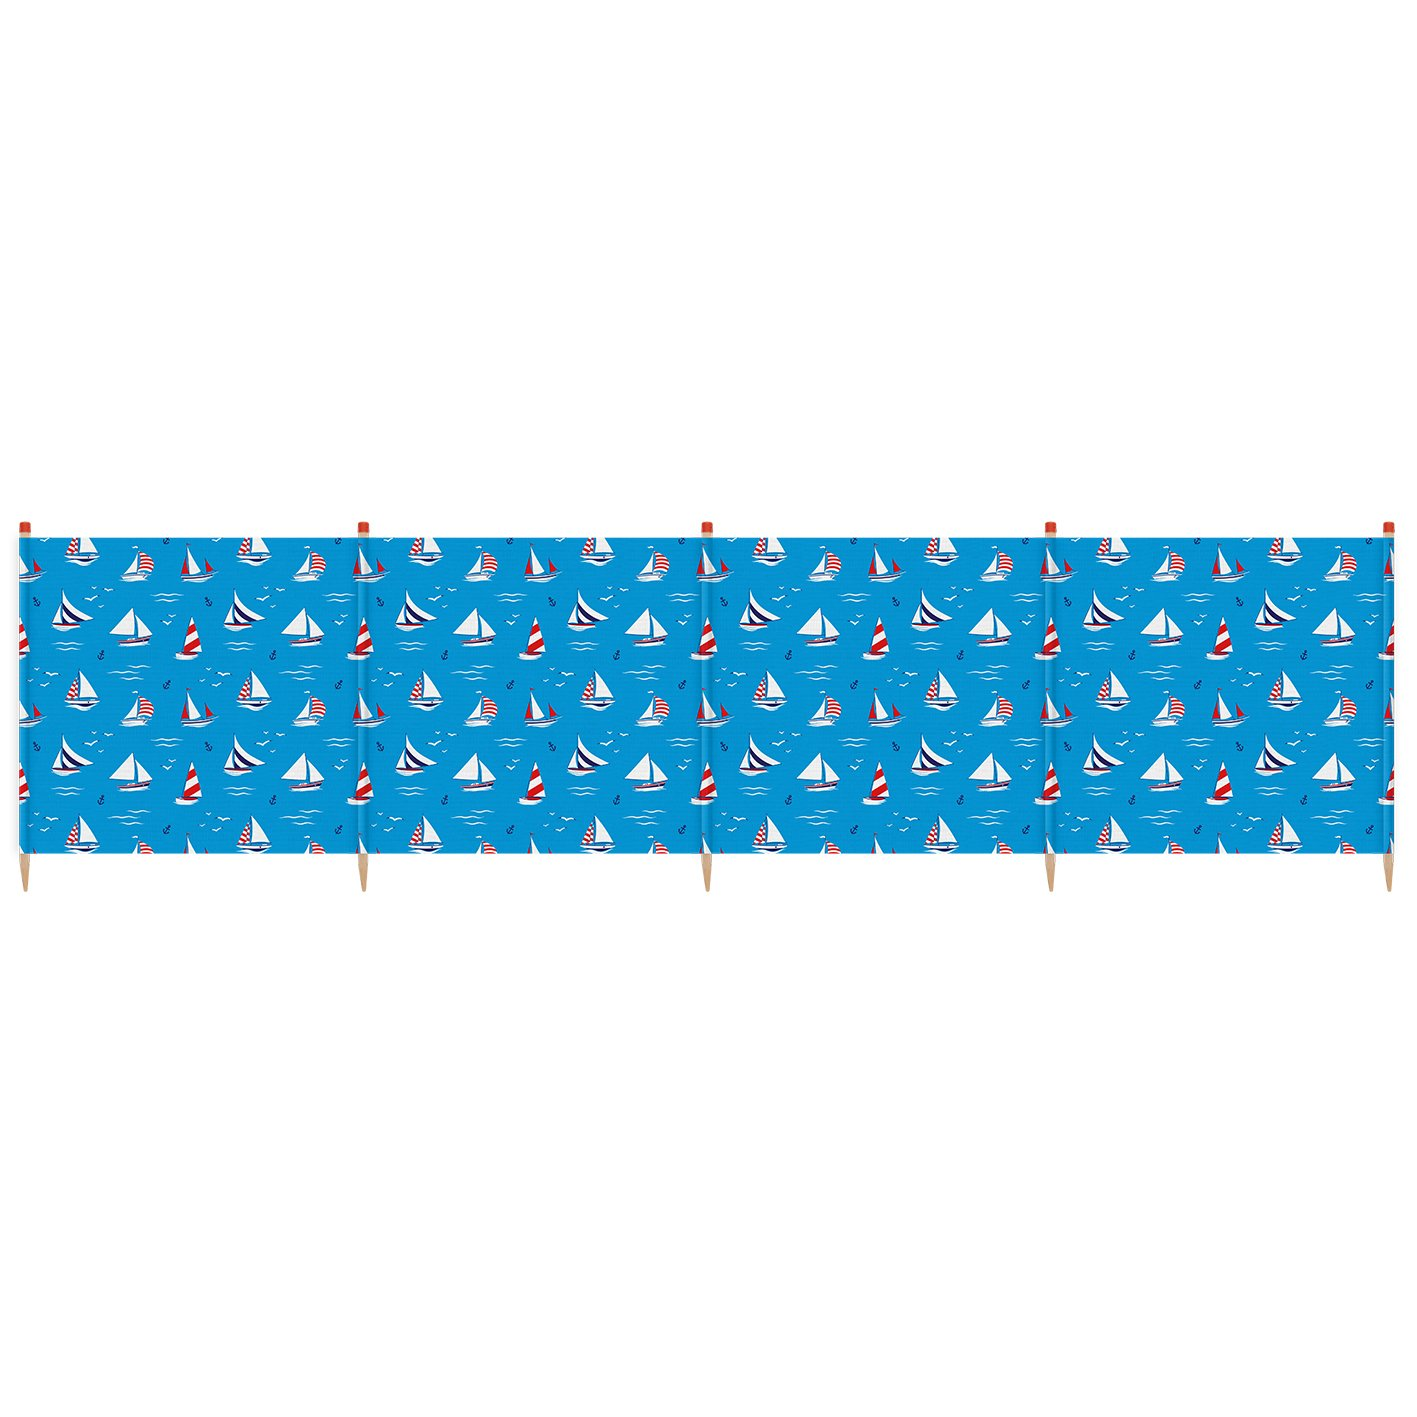 Yello Unisex Hoch Deluxe SegelStiefel 5 Pole Windschutz, blau